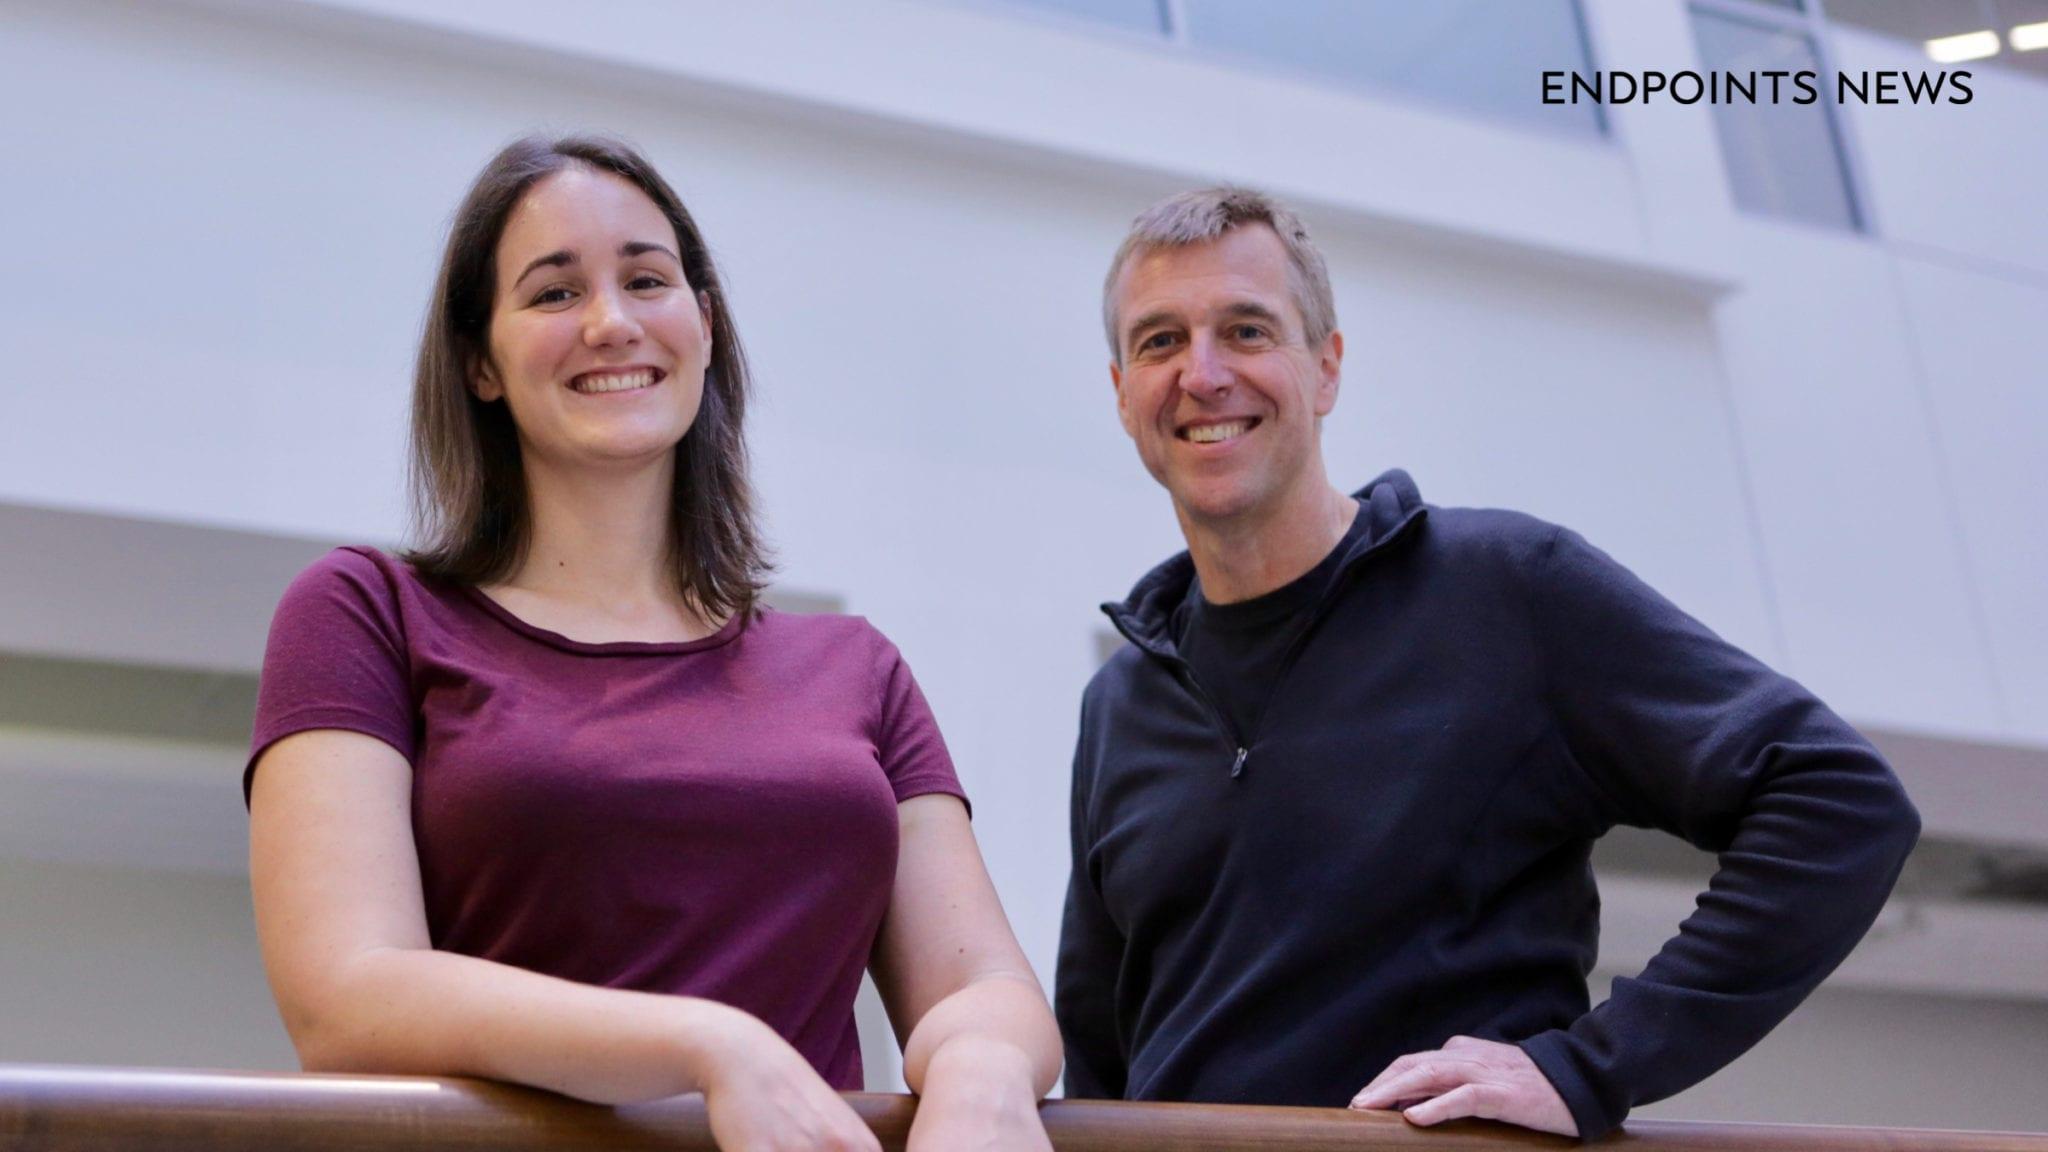 endpts.com - John Carroll - - Merck, Amgen back a $30M play for Ribometrix - one of the upstarts making its mark in drugging RNA